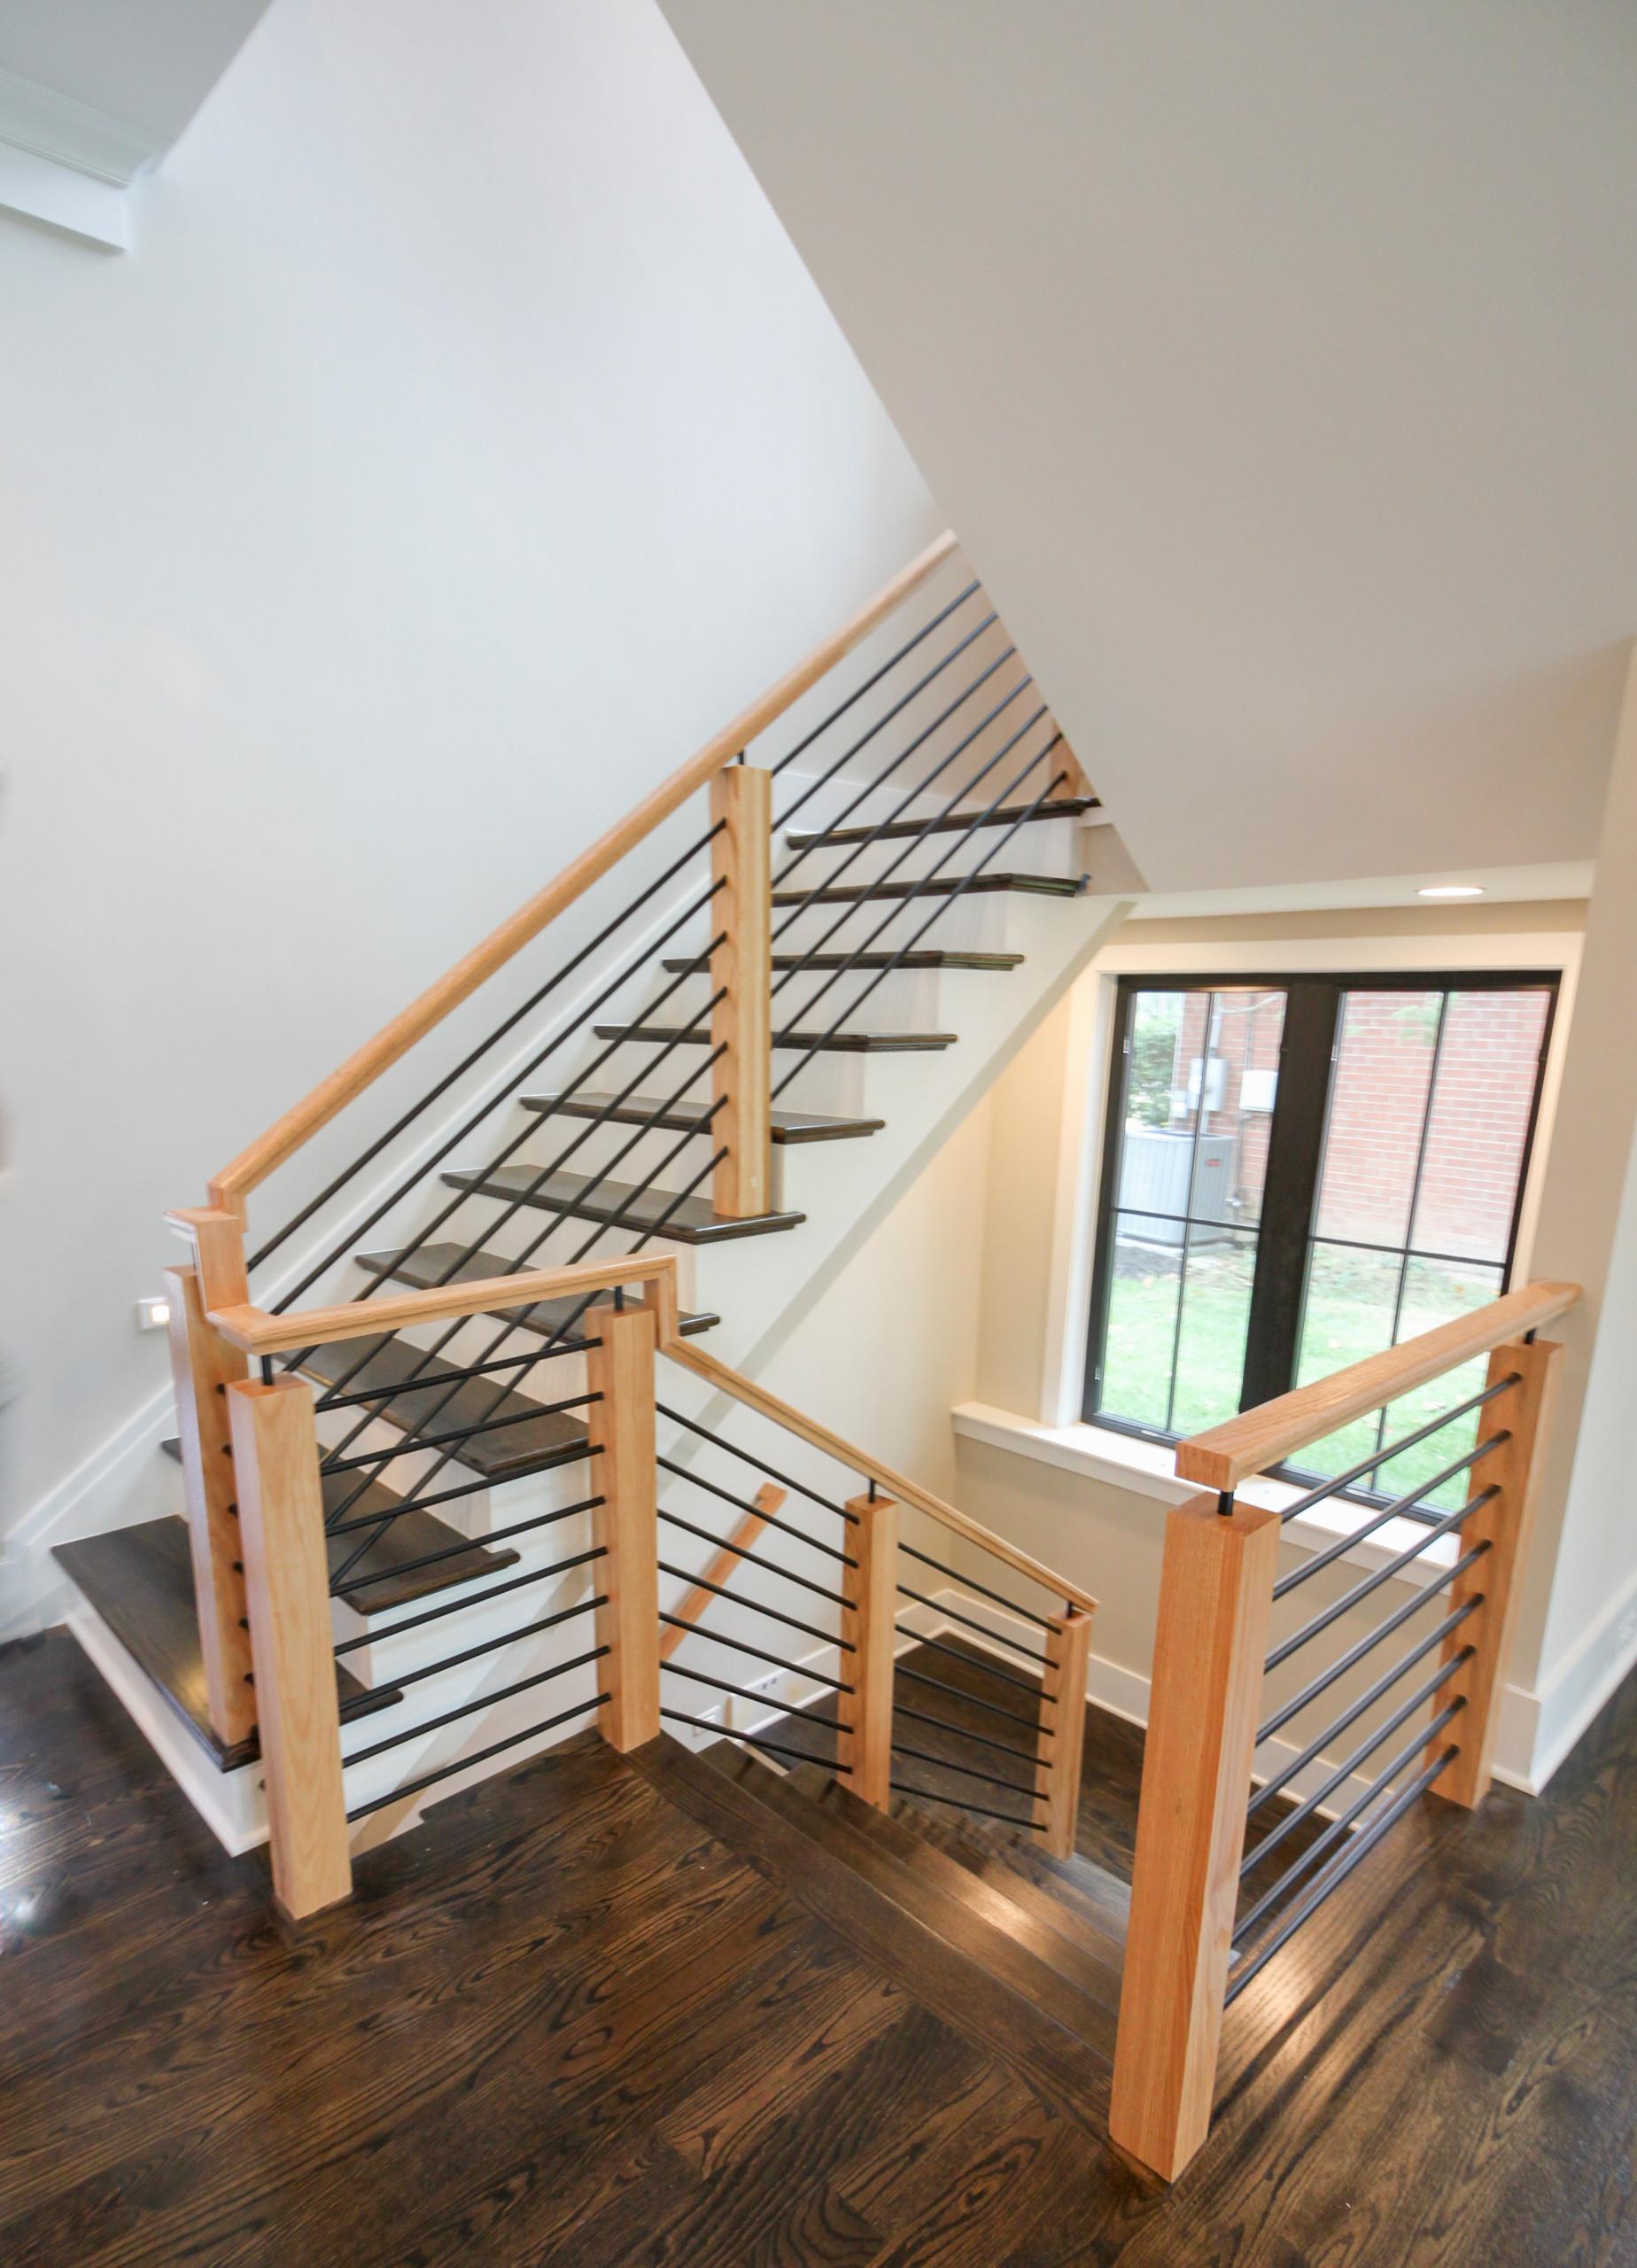 69_Stunning Natural Handrails & Newels + Horizontal Metal Rods, Bethesda MD 2081